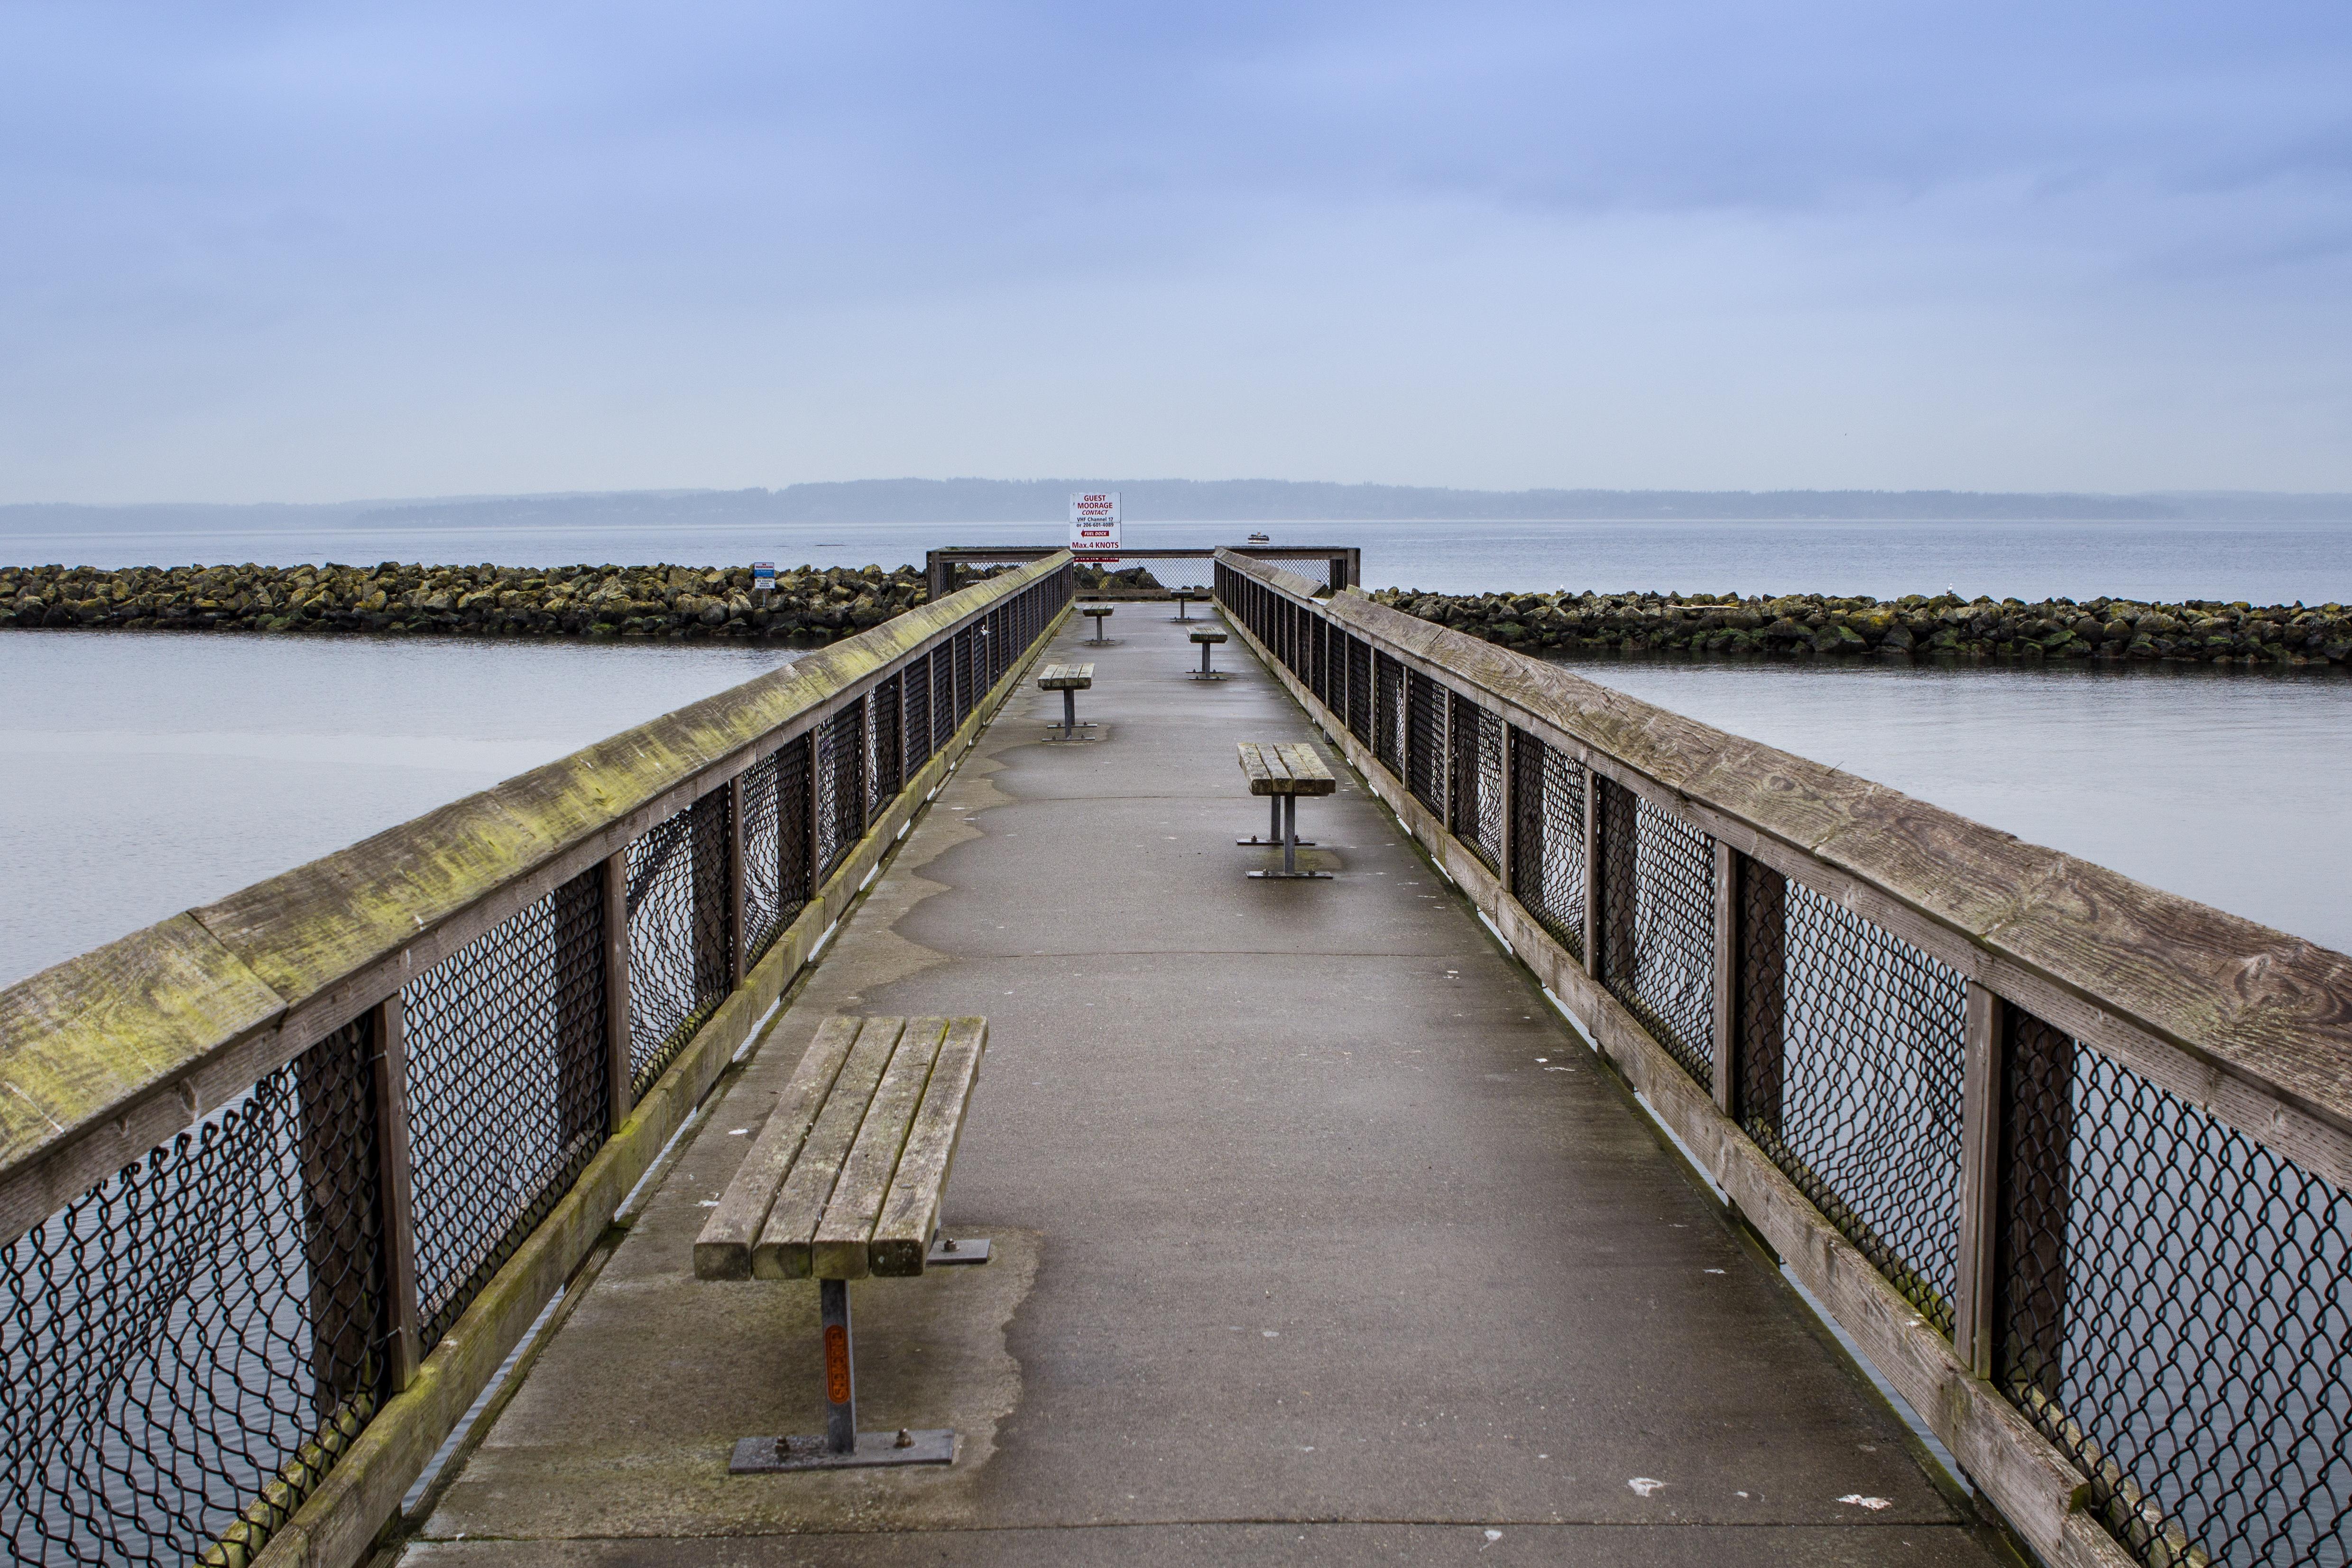 Bridge, Blue, Old, Sea, Water, HQ Photo